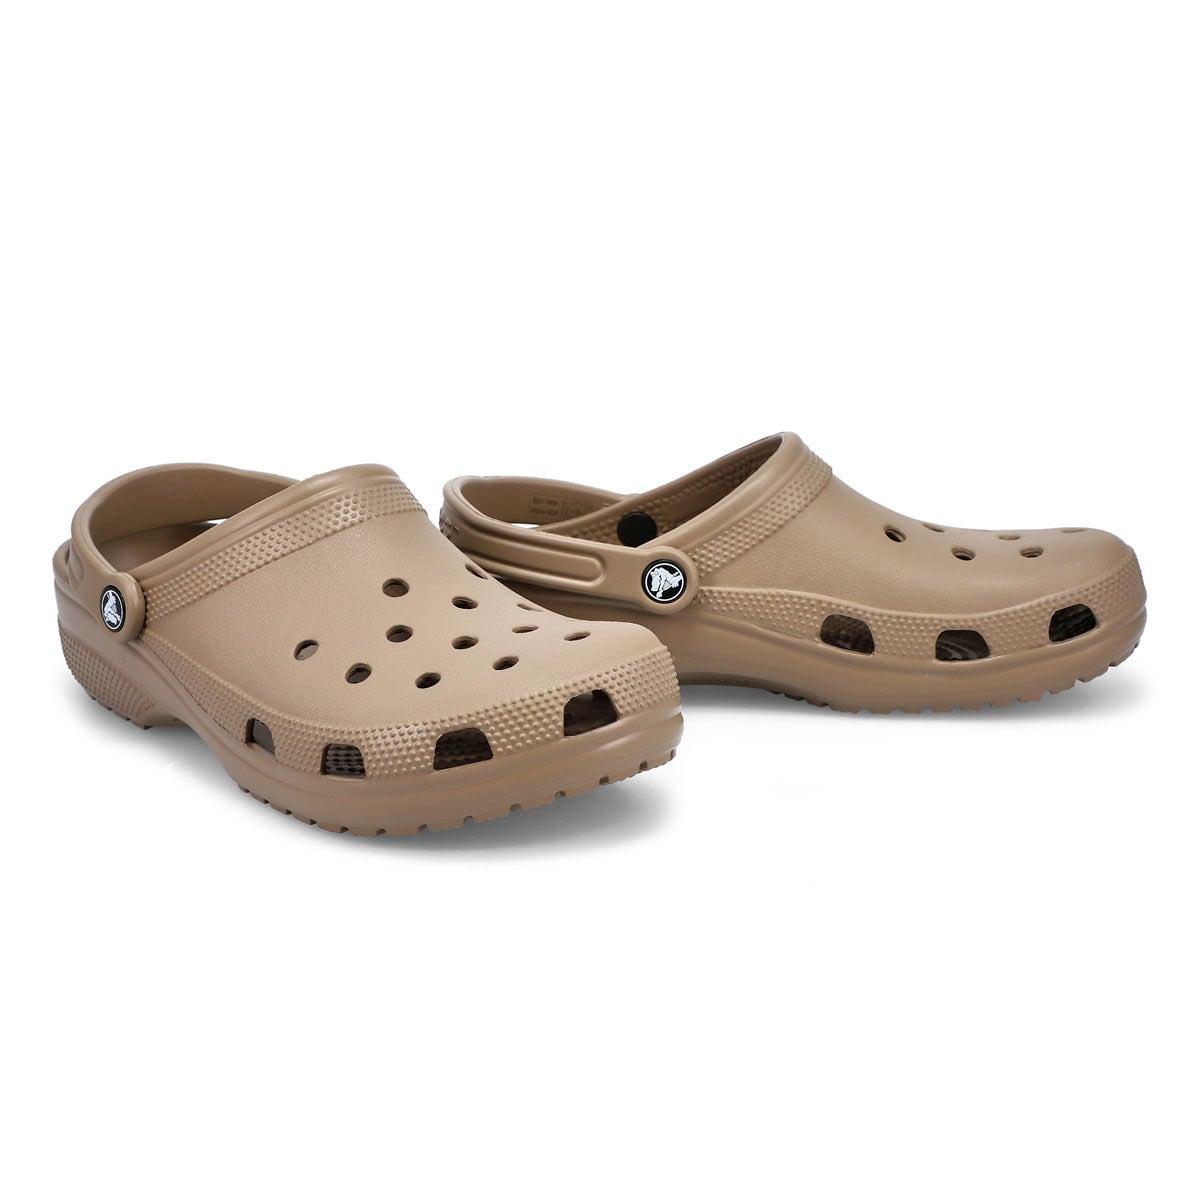 Men's Classic EVA Clog - Khaki